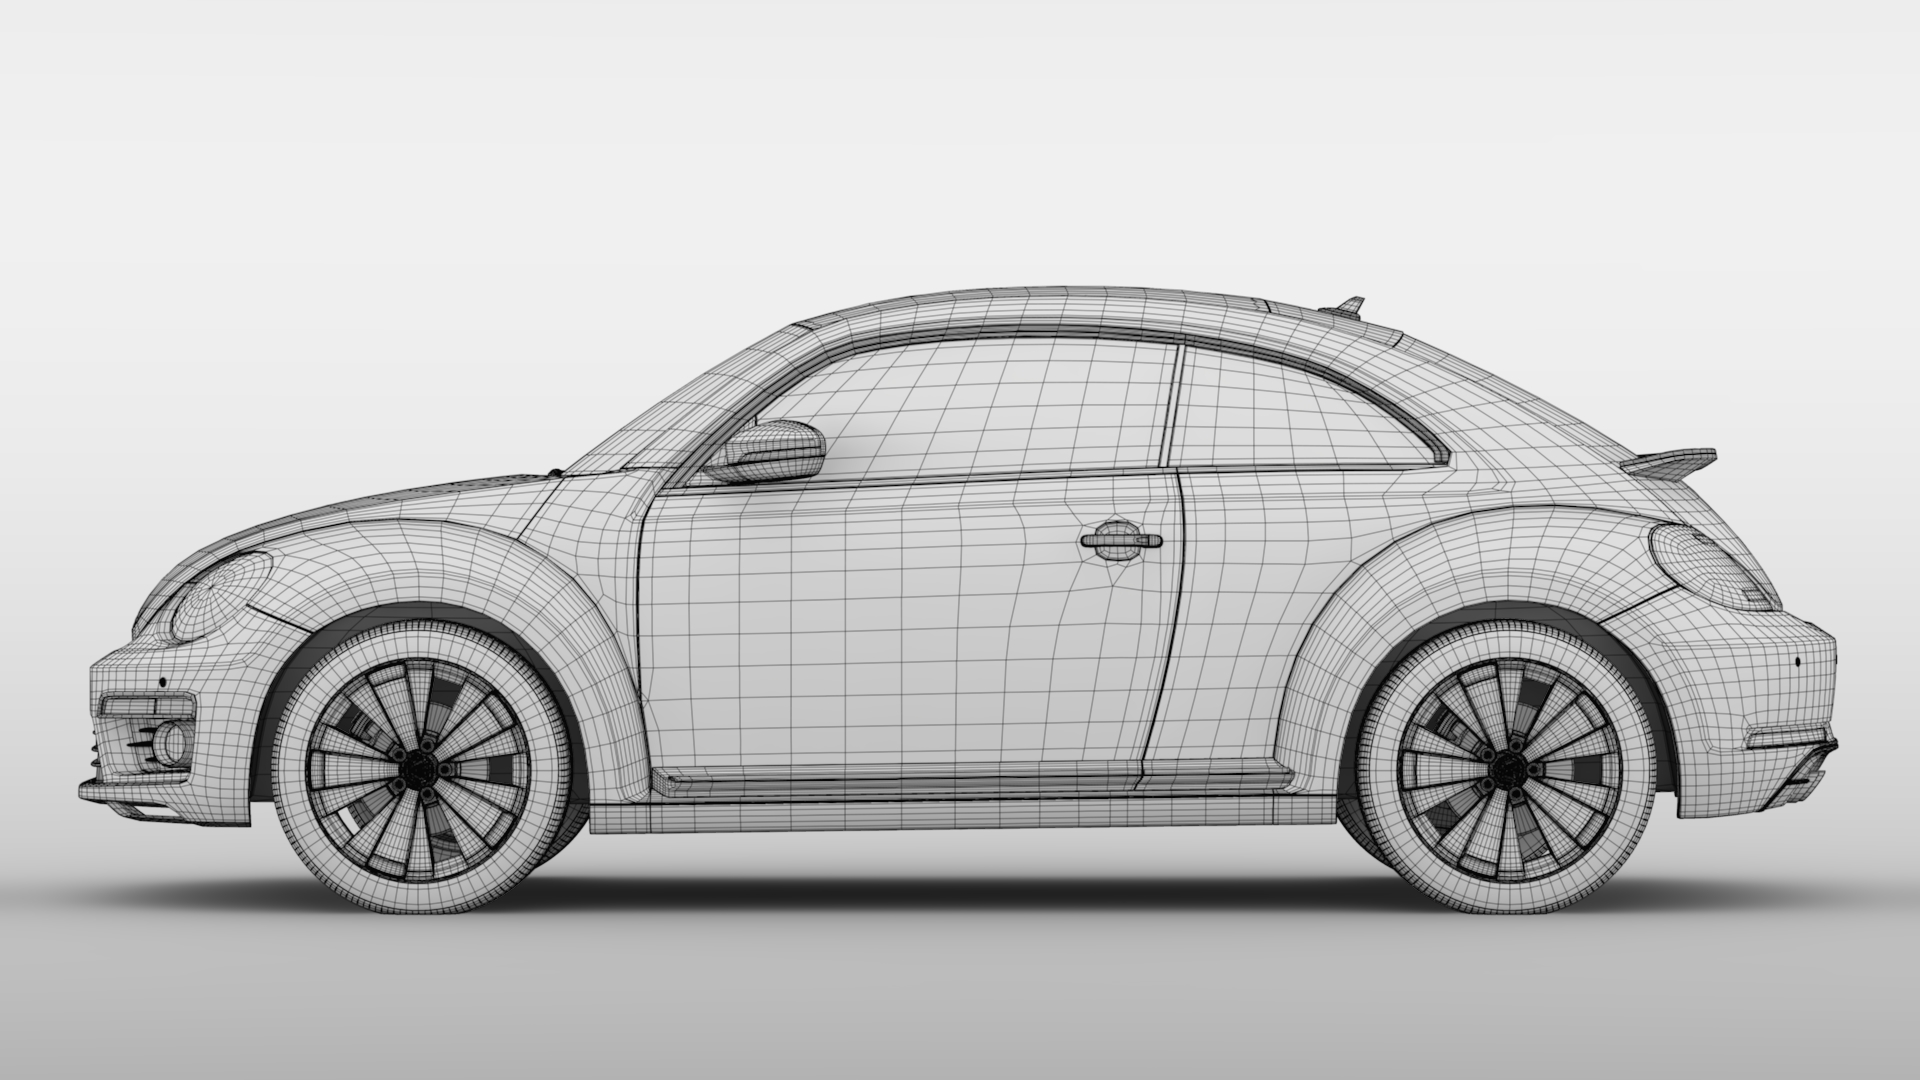 vw beetle 2017 3d model 3ds max fbx c4d lwo ma mb hrc xsi obj 221584